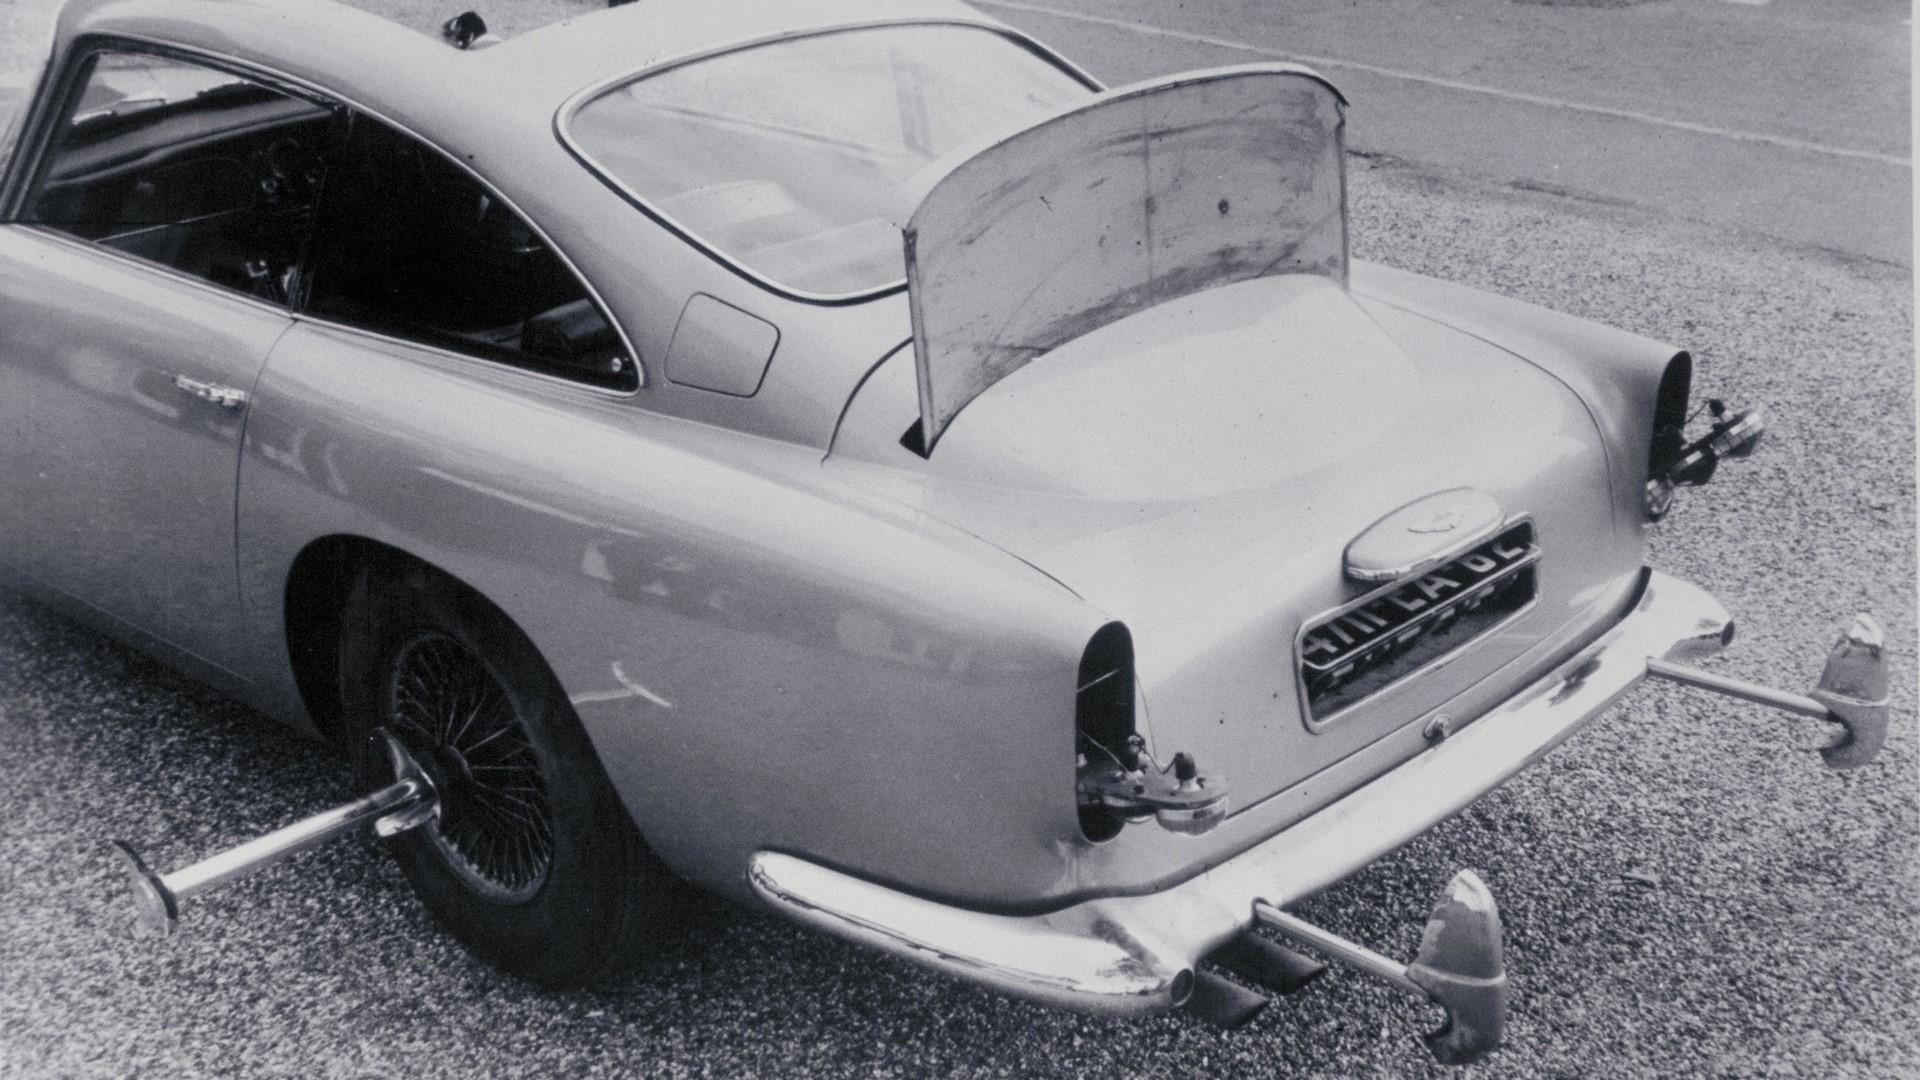 aston-martin-db5-goldfinger-continuation-car-1-12